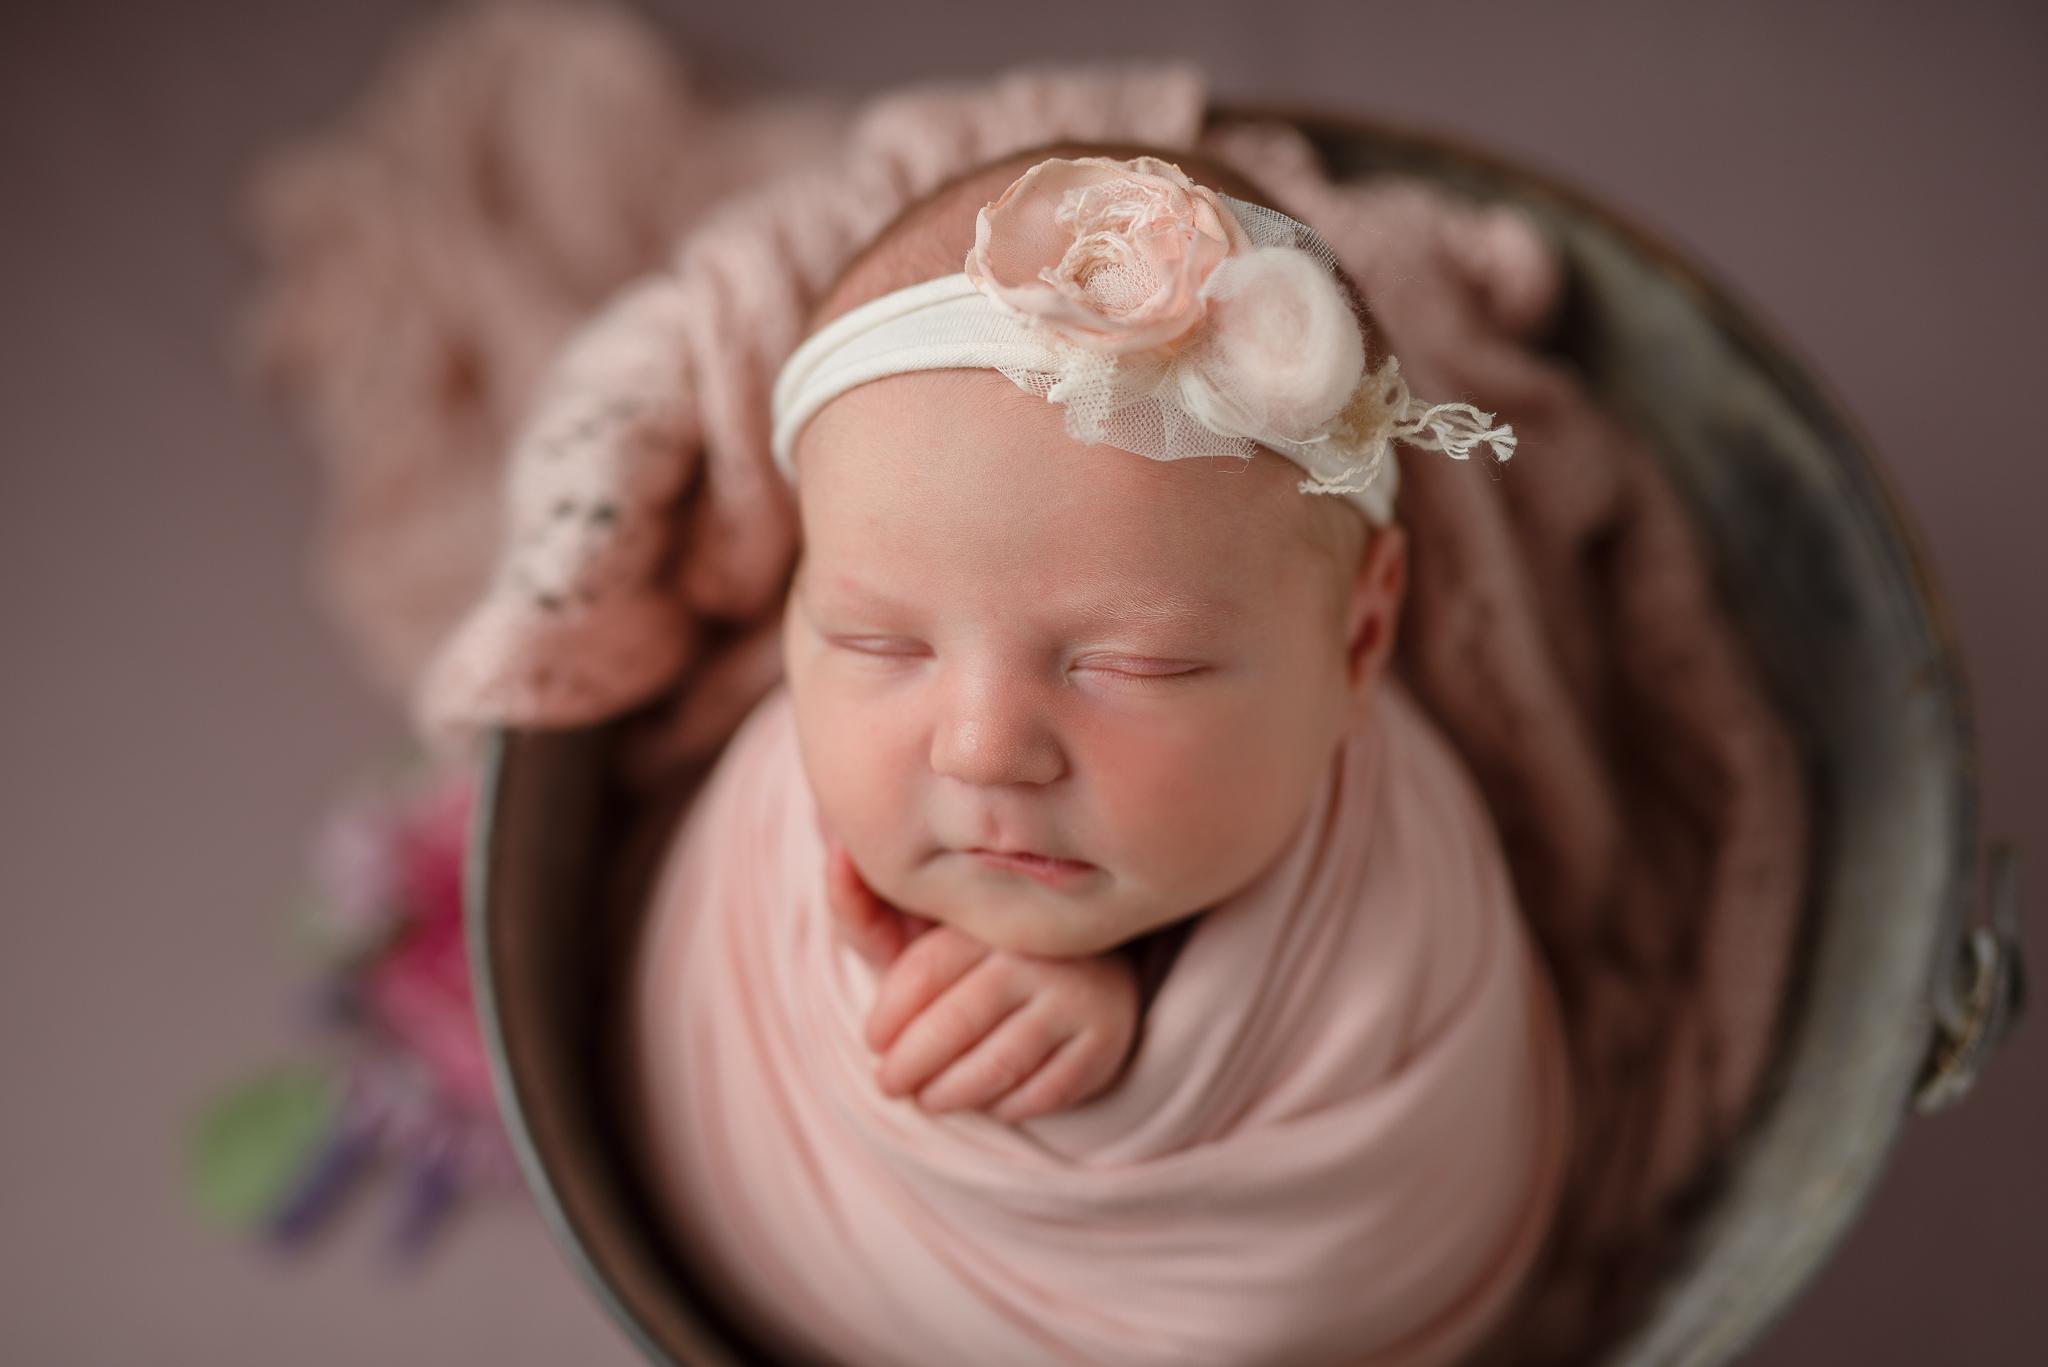 Newborn112NaomiLuciennePhotography032019-2-Edit.jpg